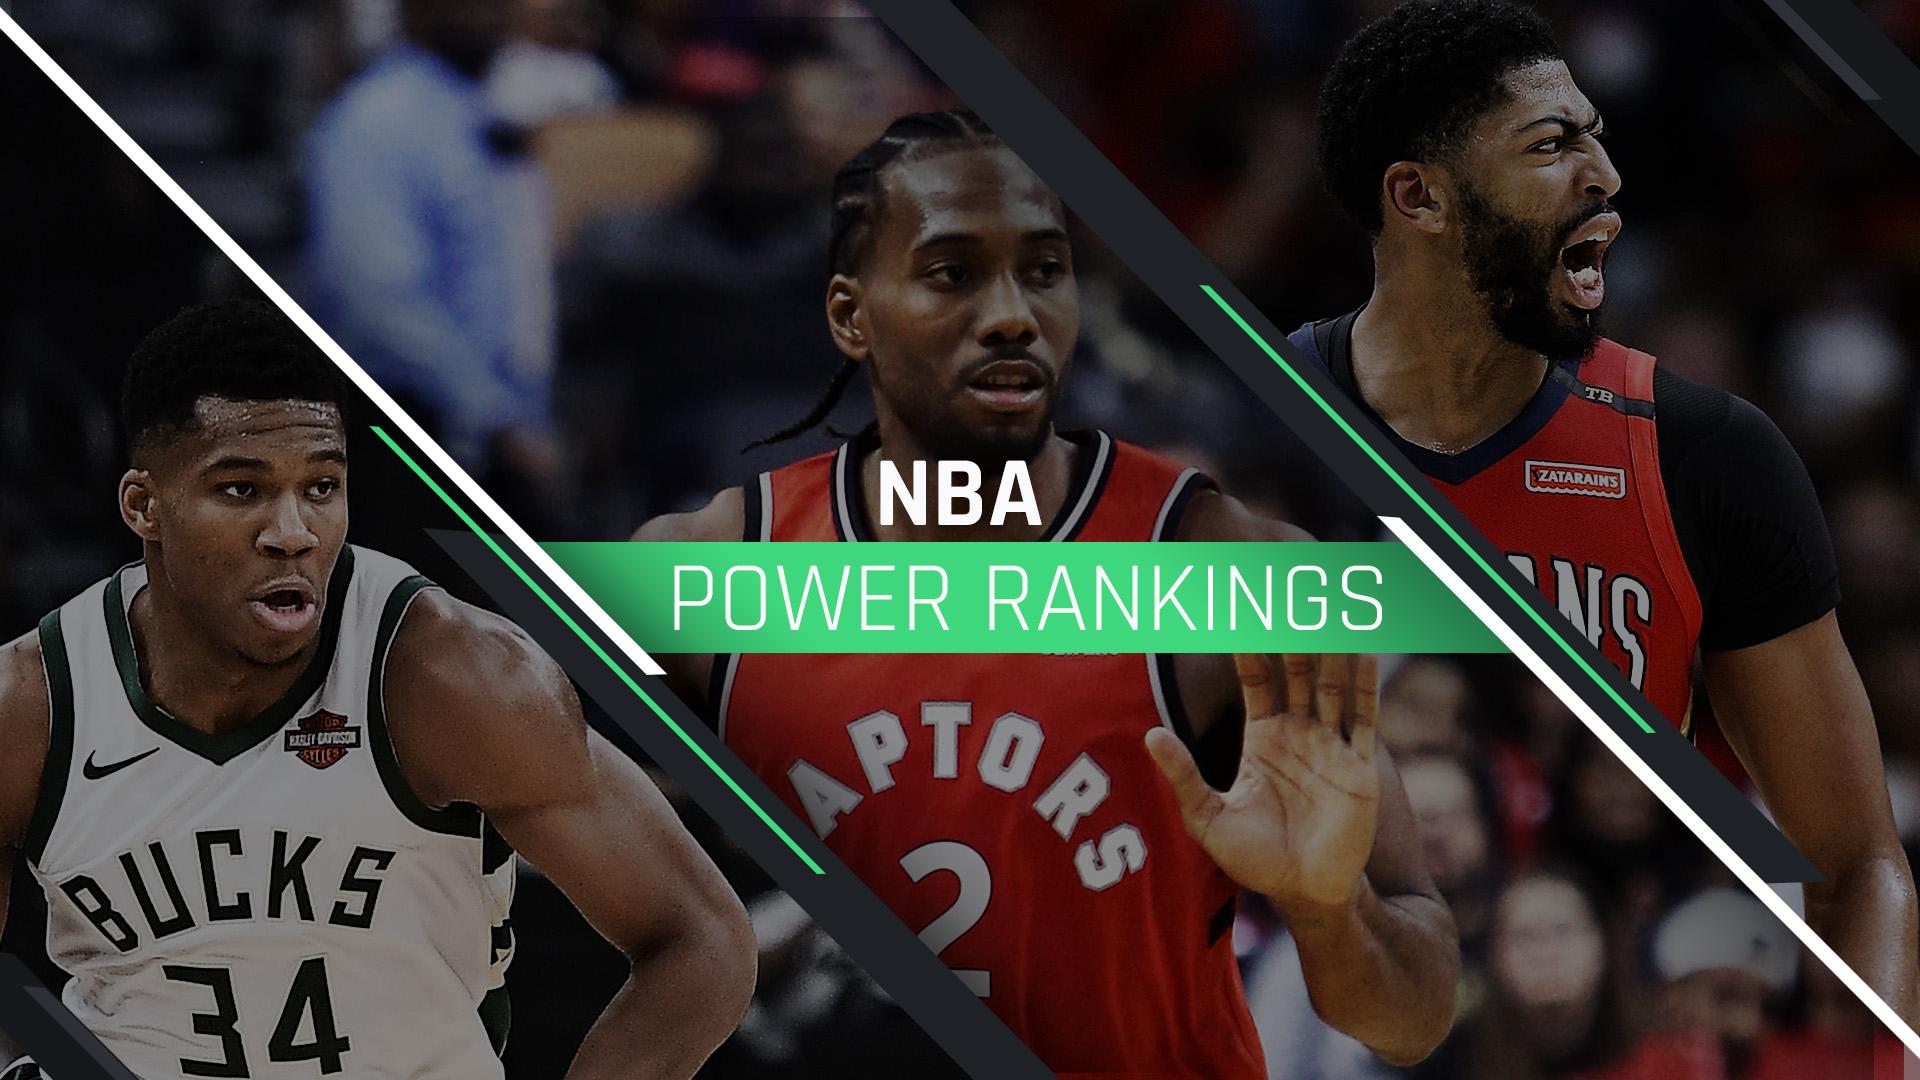 NBA Power Rankings: Bucks ride defense to top; Pelicans hurt by lack of depth